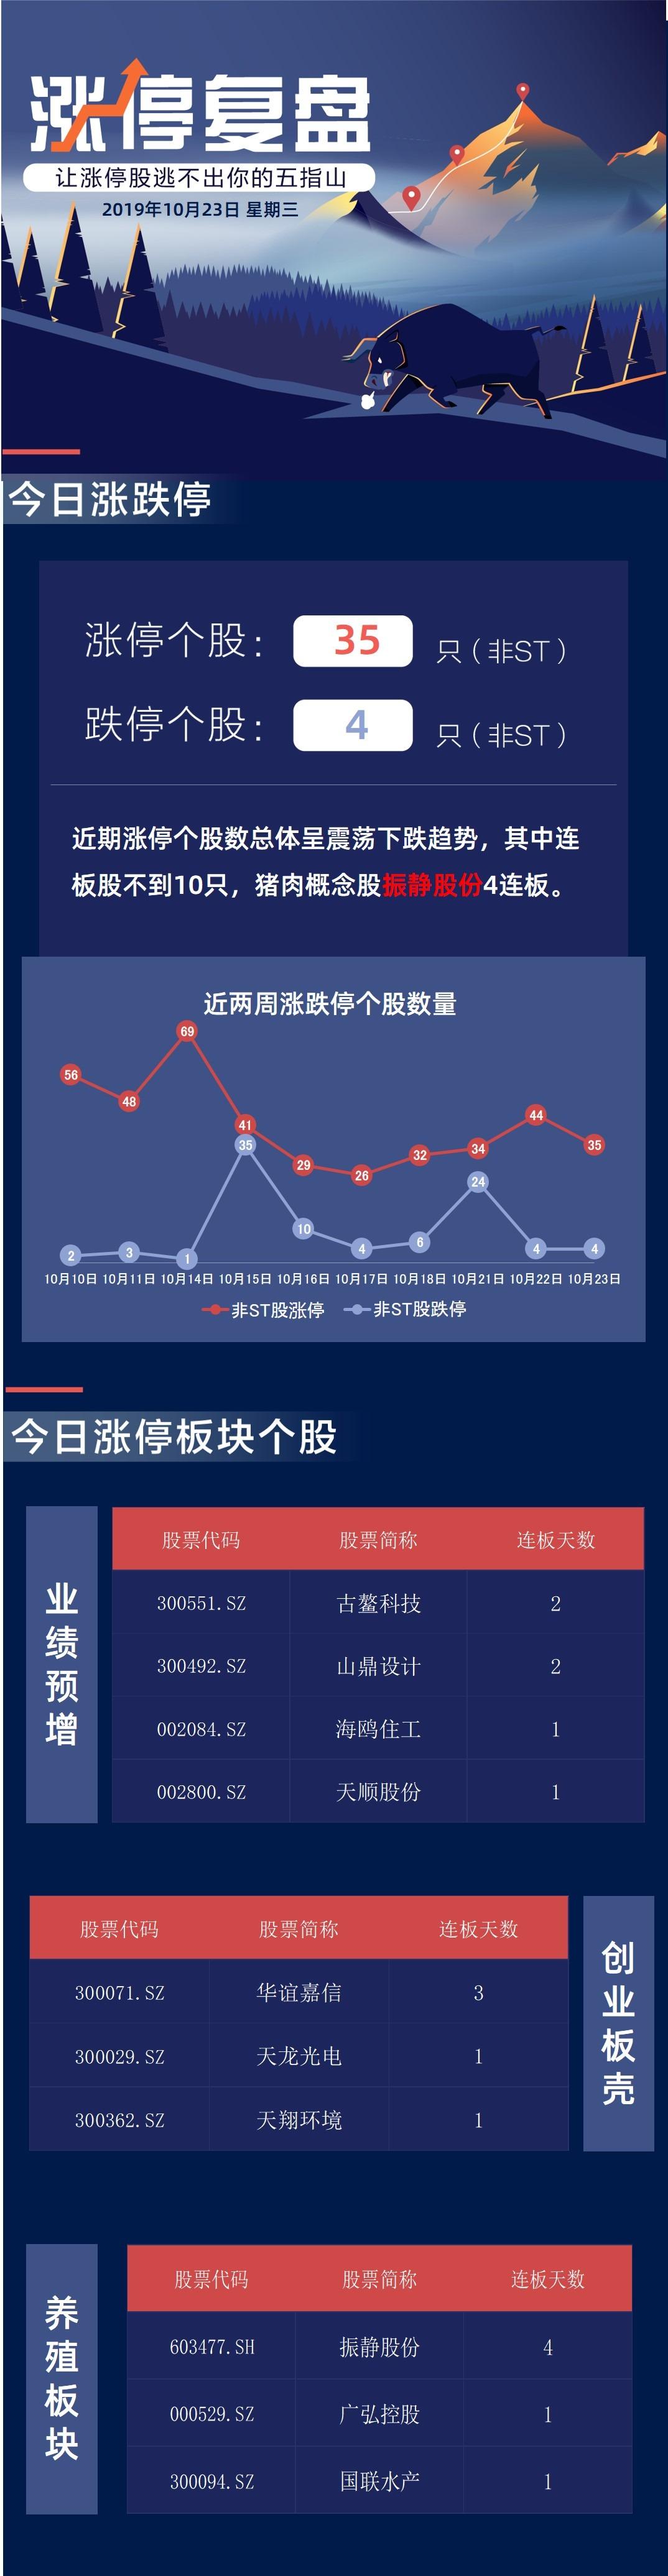 im体育平台,零售业务规模持续增长,苏农银行前三季盈利8.28亿元